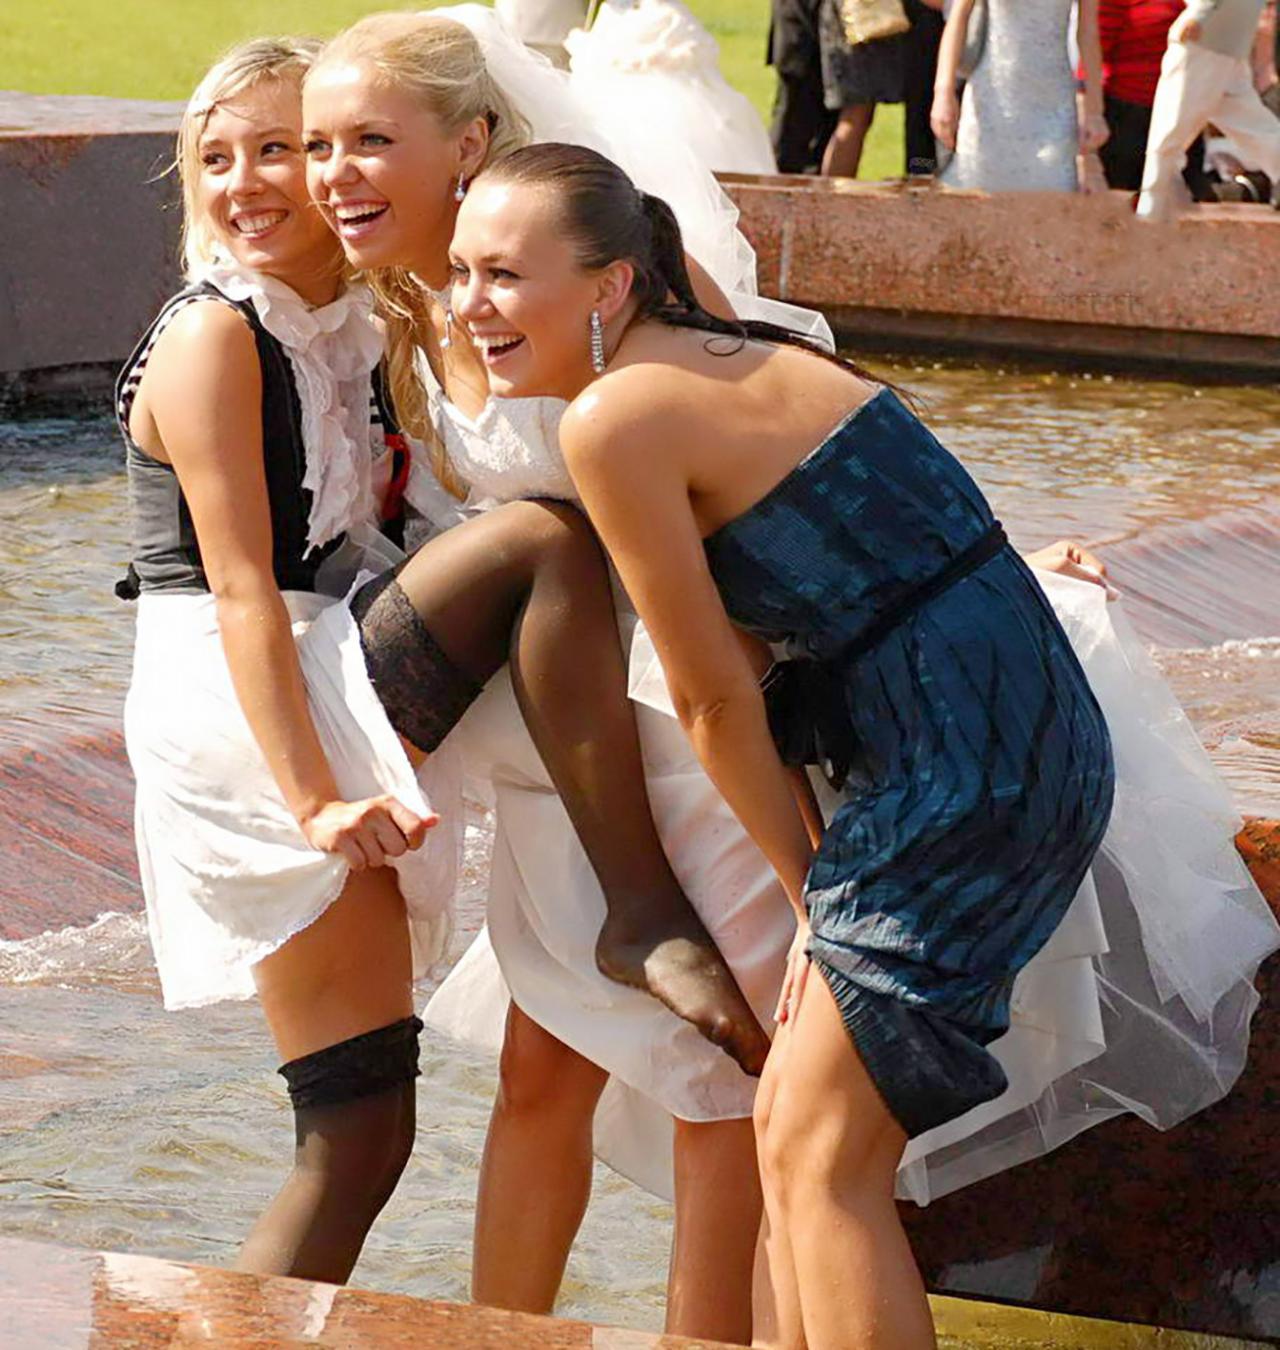 Свидетельница на свадьбе затмила невесту